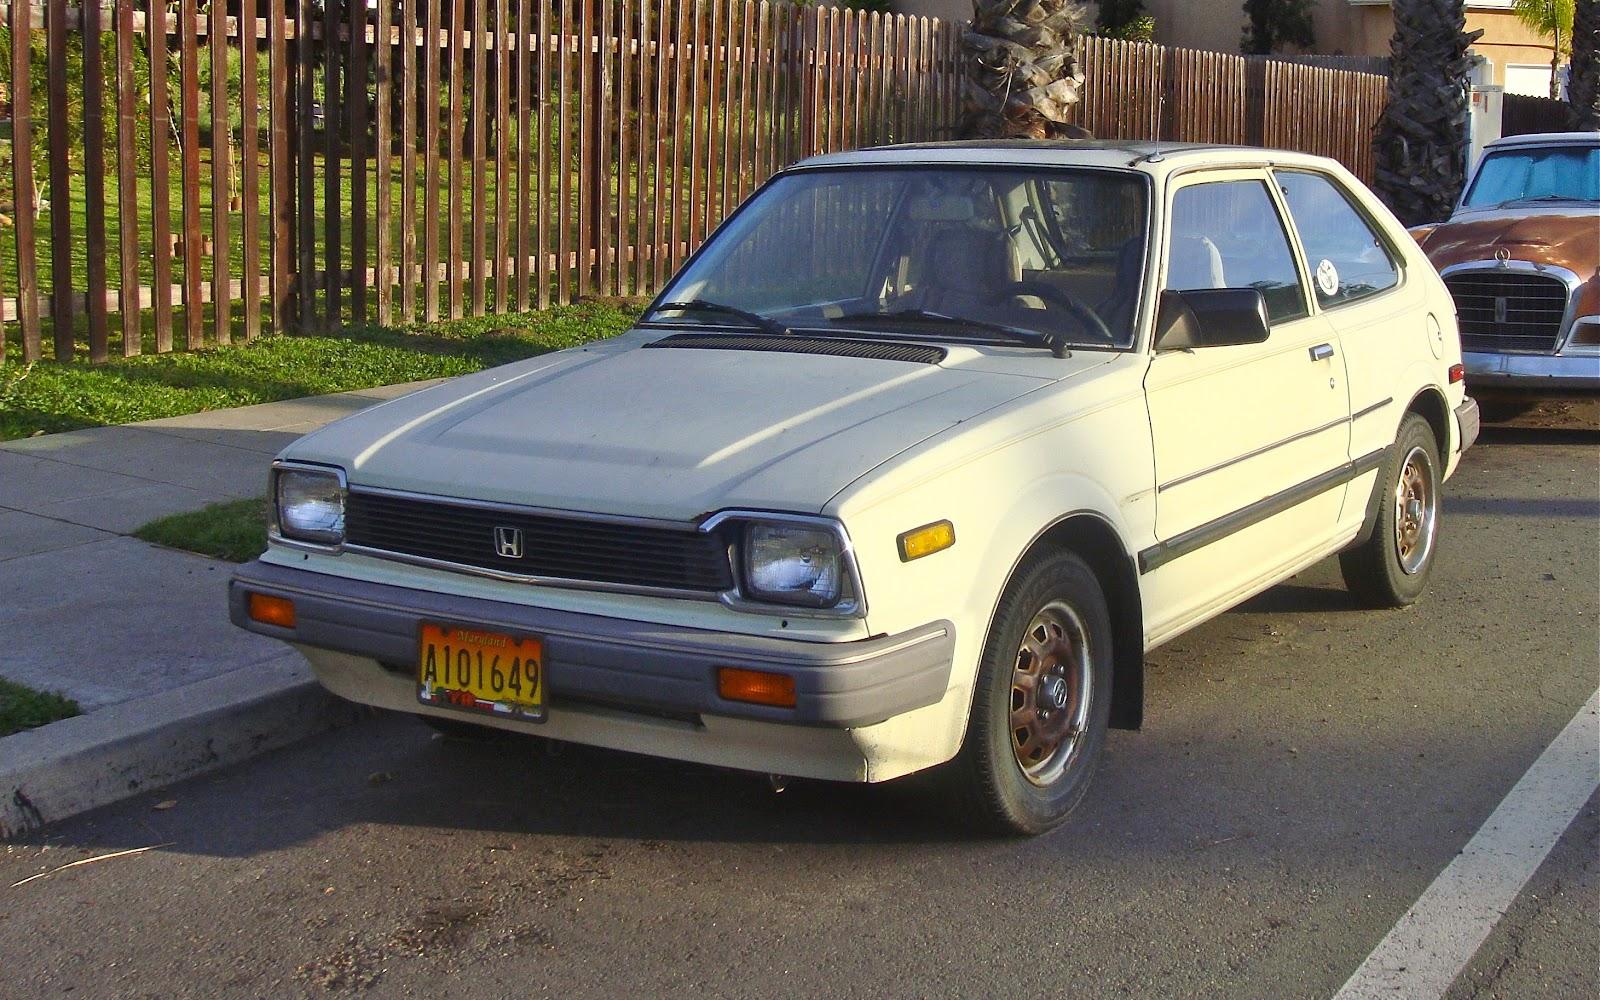 THE STREET PEEP: 1983 Honda Civic 1500DX